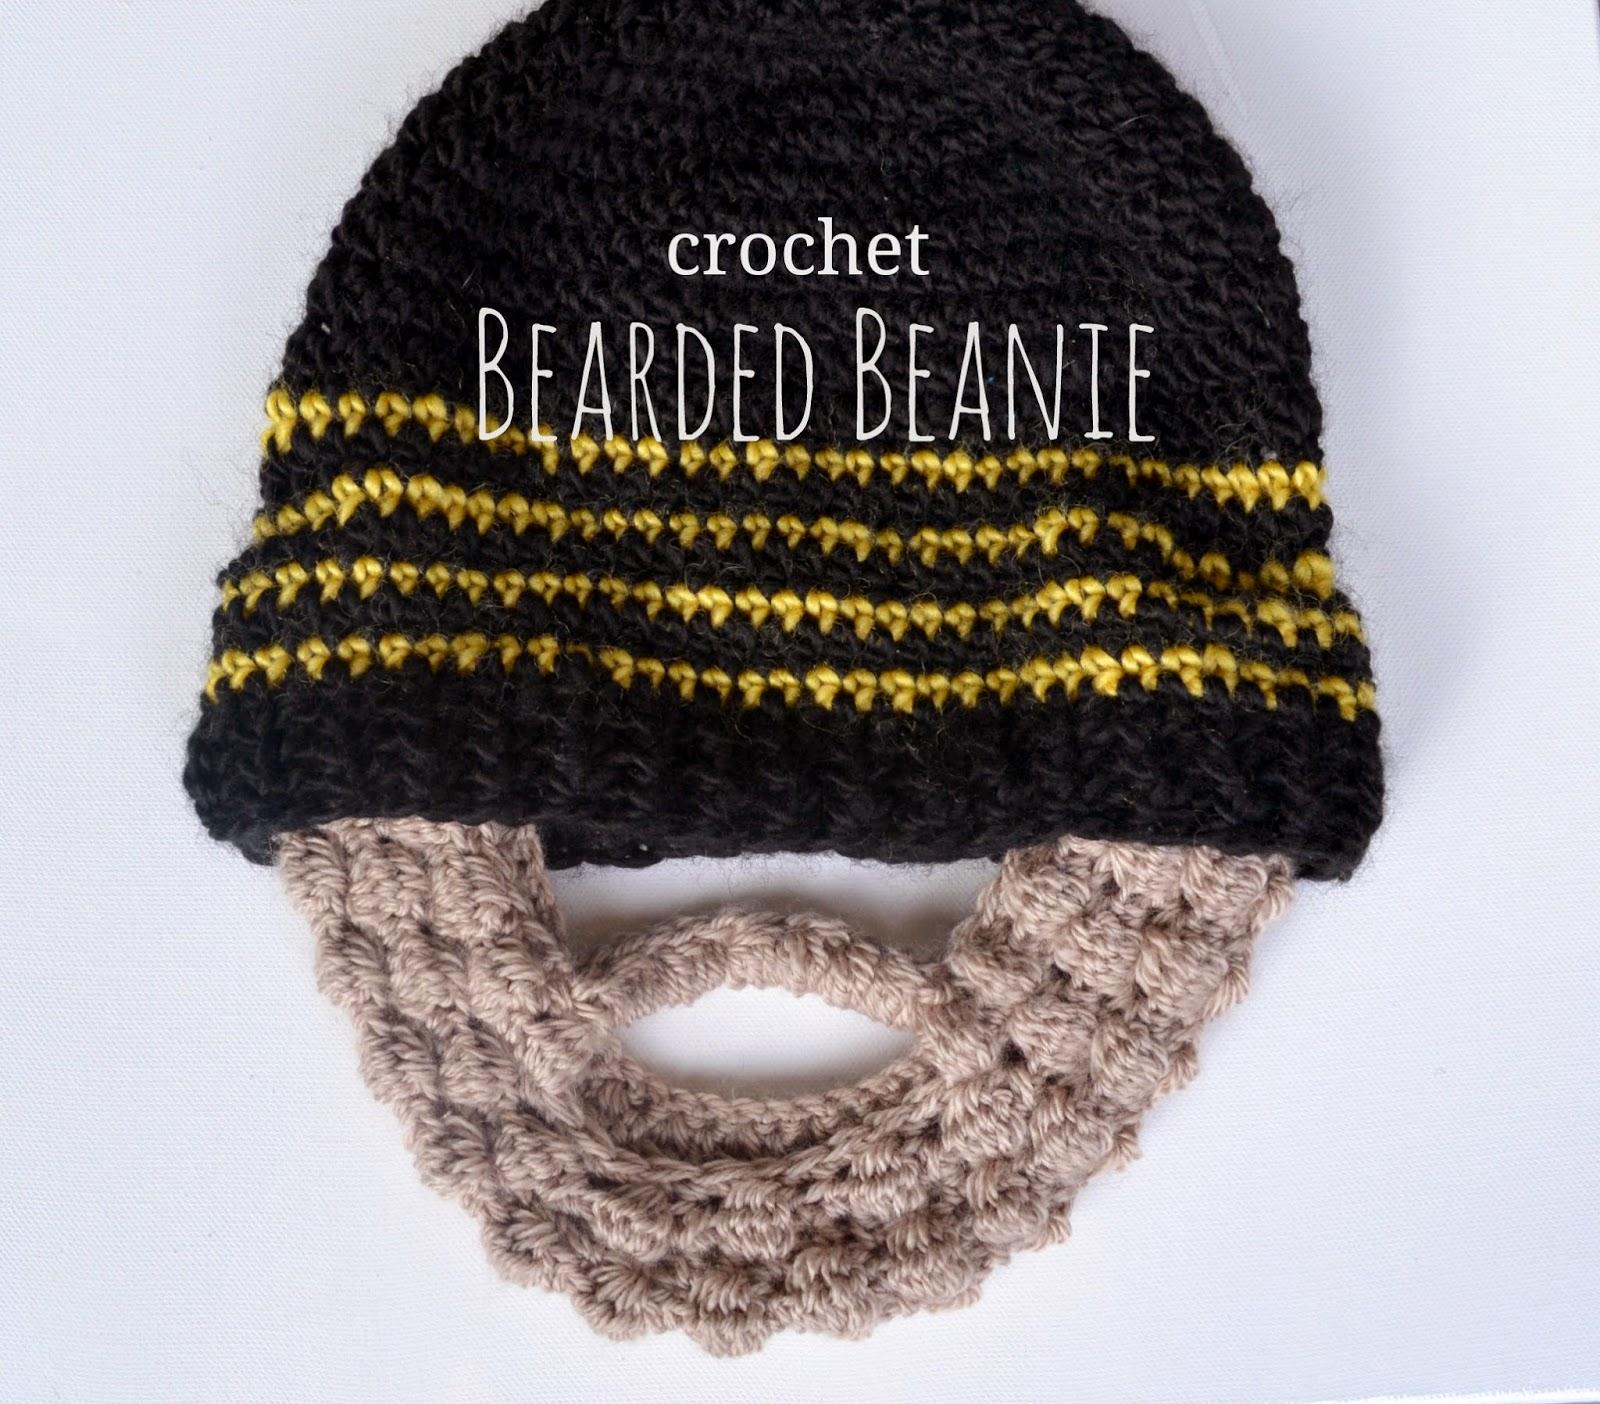 Granny Square Flair: Crochet Beard Beanie